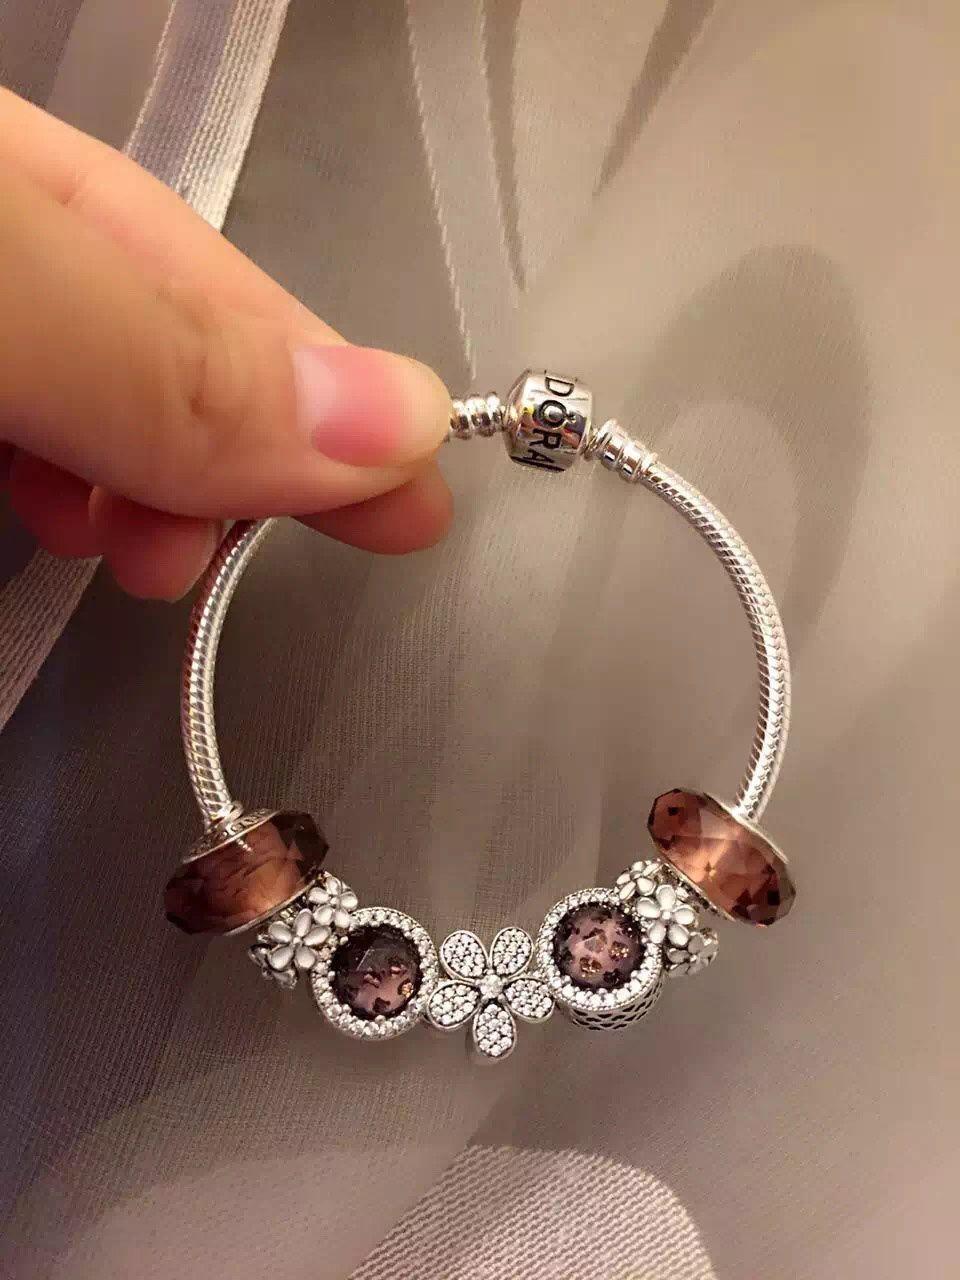 Pandora Sterling Silver Charm Bracelet CB01834 - Pandora ...